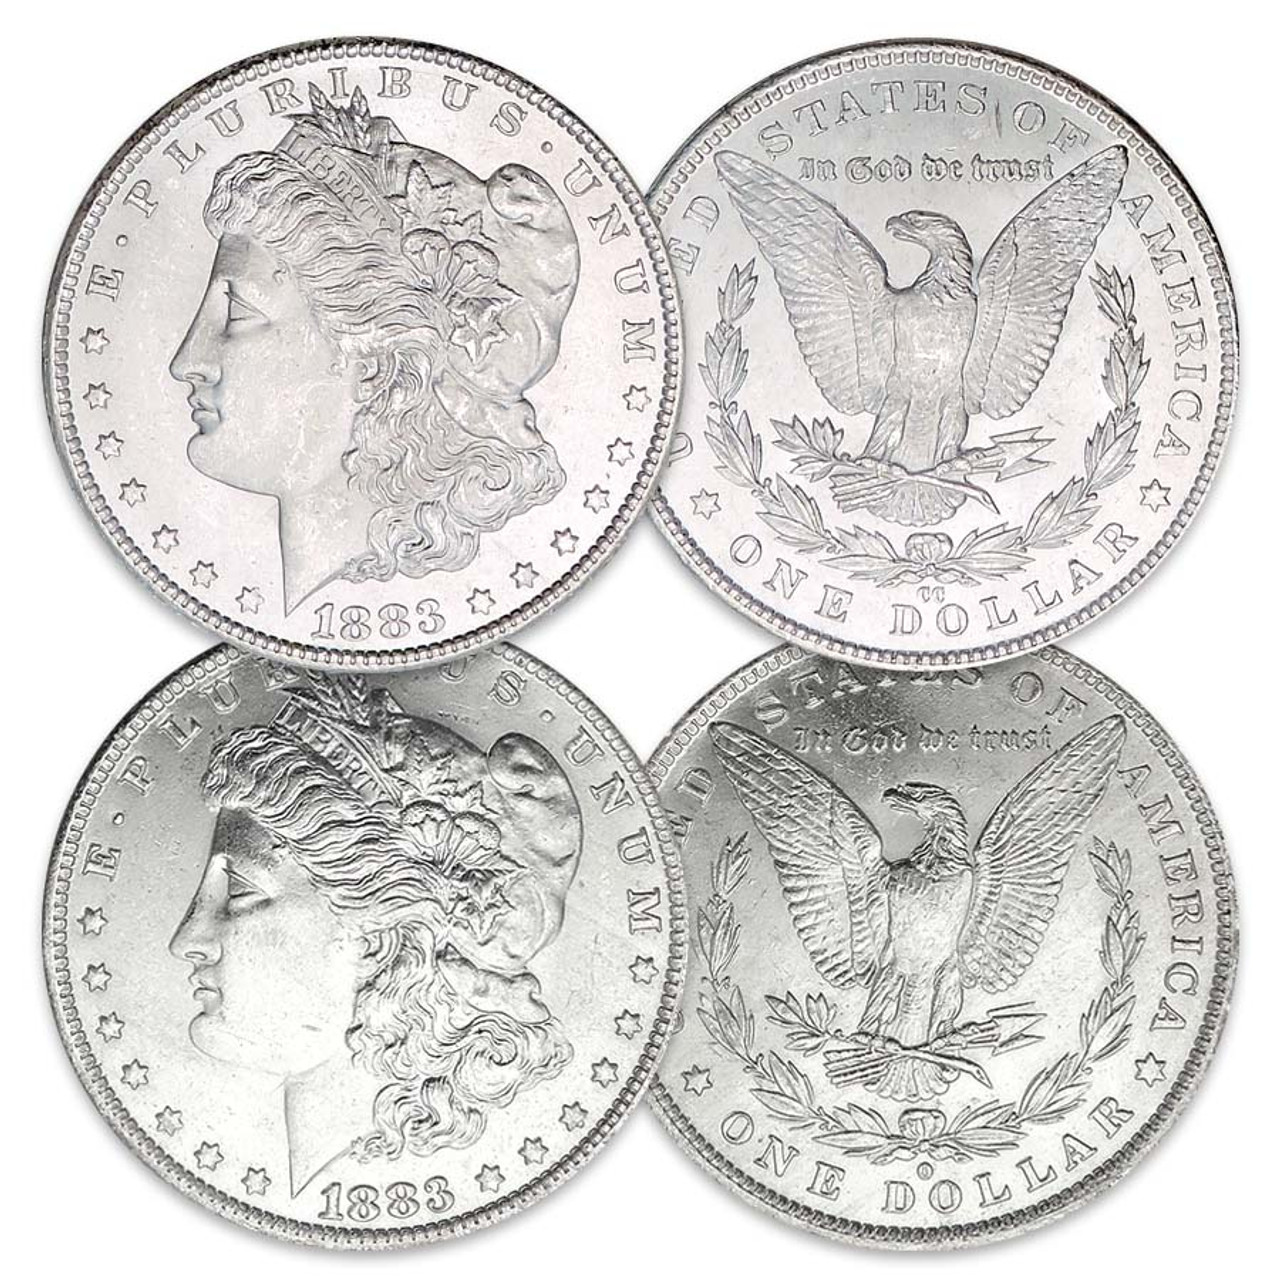 1883-CC Morgan Silver Dollar Brilliant Uncirculated with FREE Morgan Silver Dollar